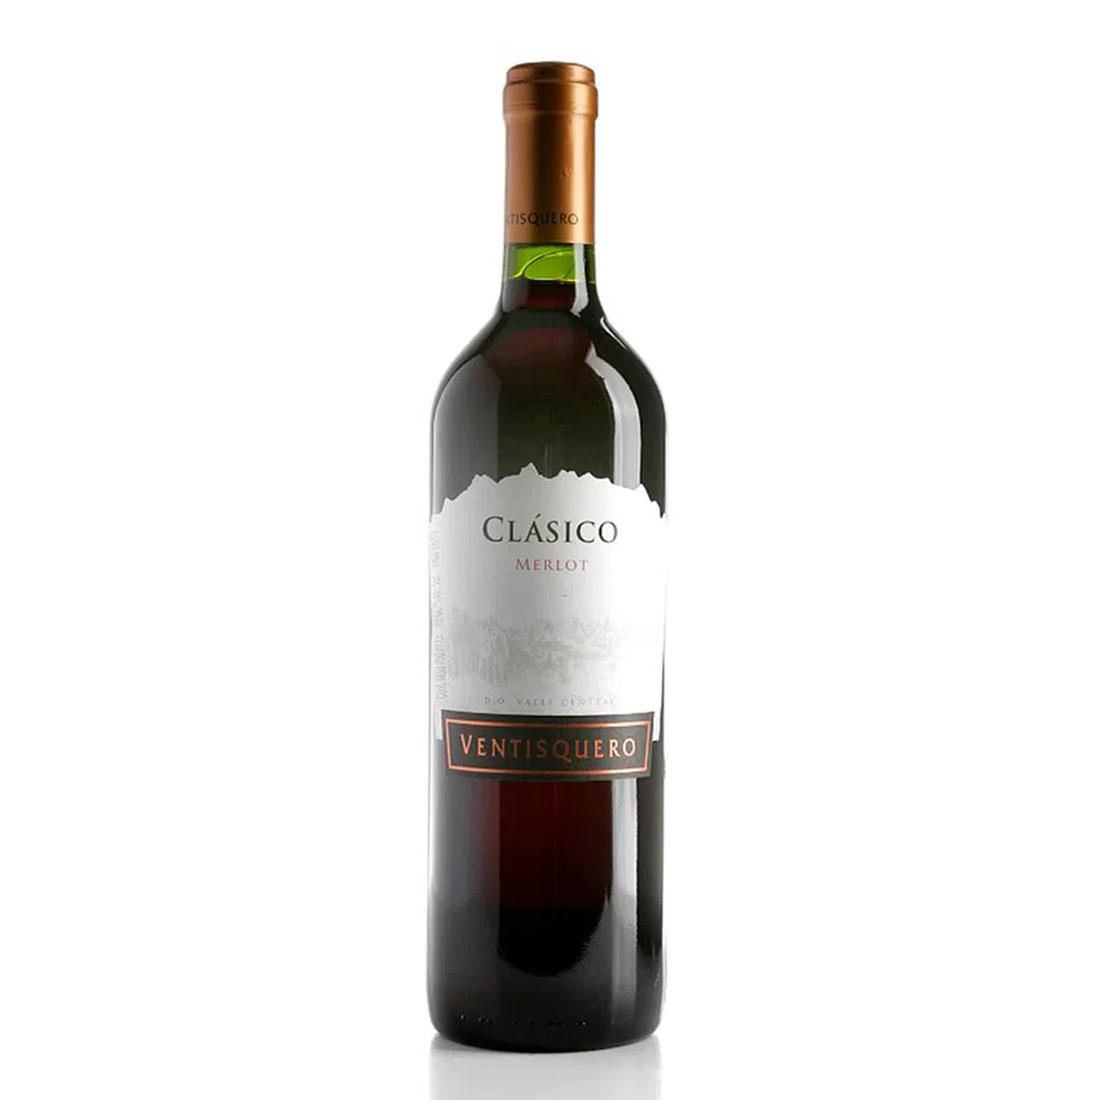 Vinho Ventisquero Clássico Merlot 750 ml